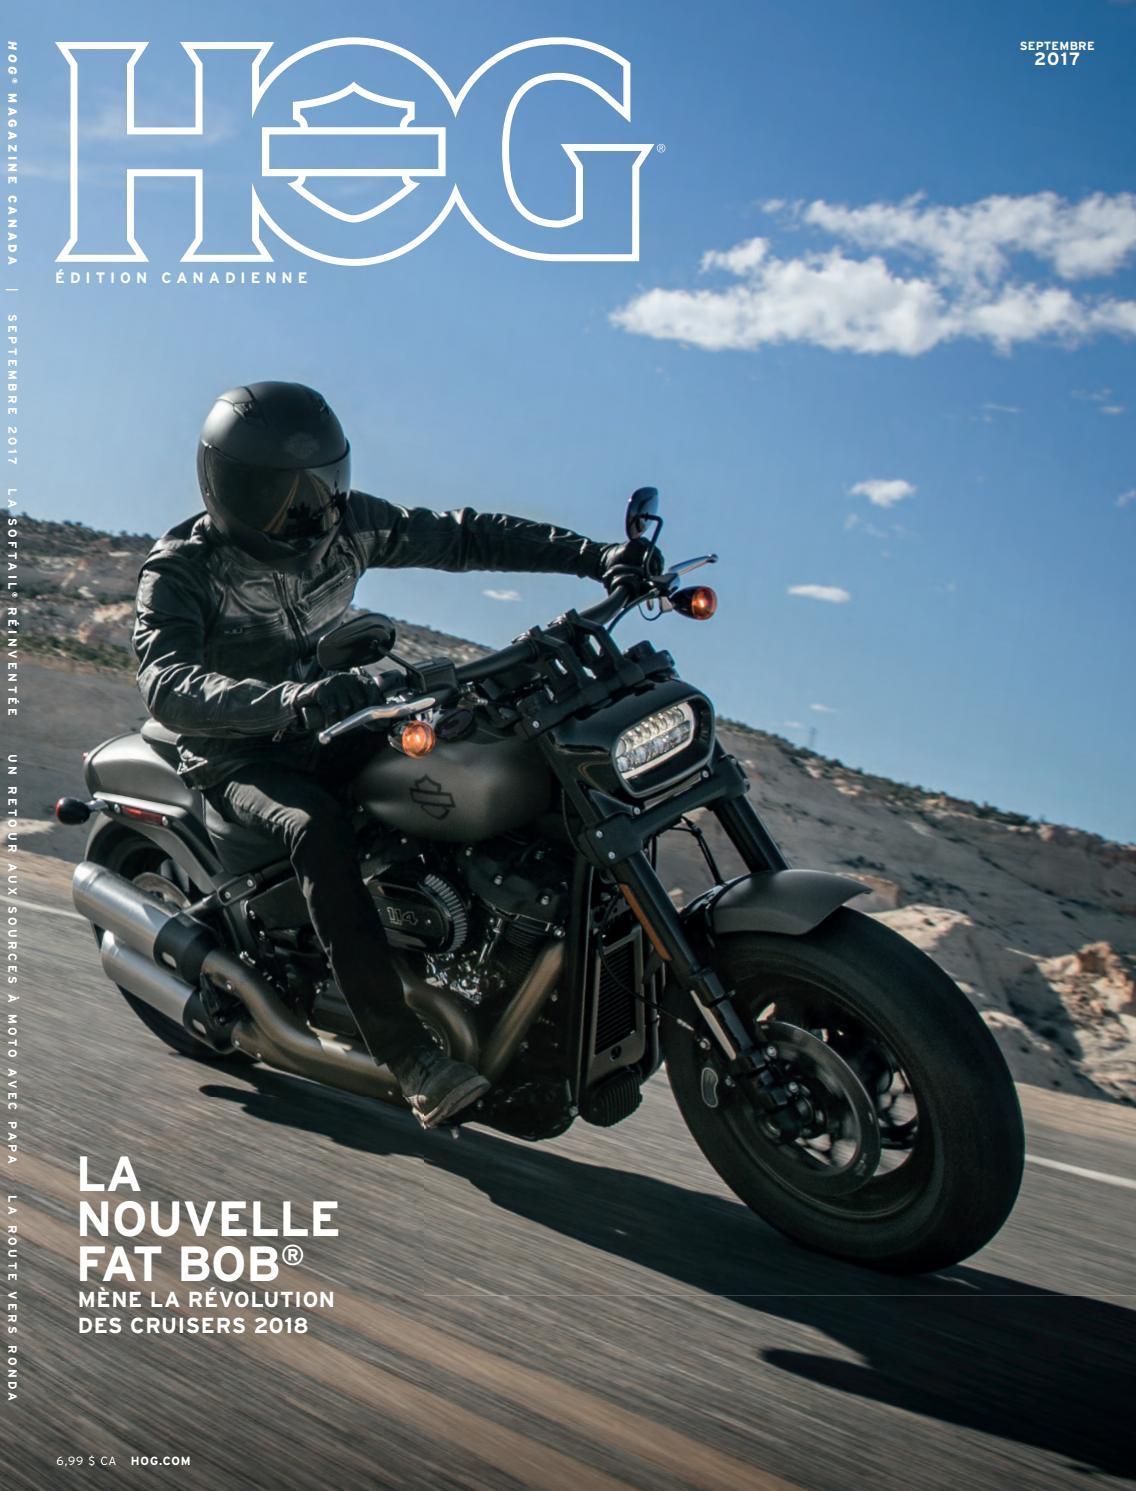 Pour Harley Touring 1999-2015 Dyna Street Glide Softail bord latérale du moteur couvre